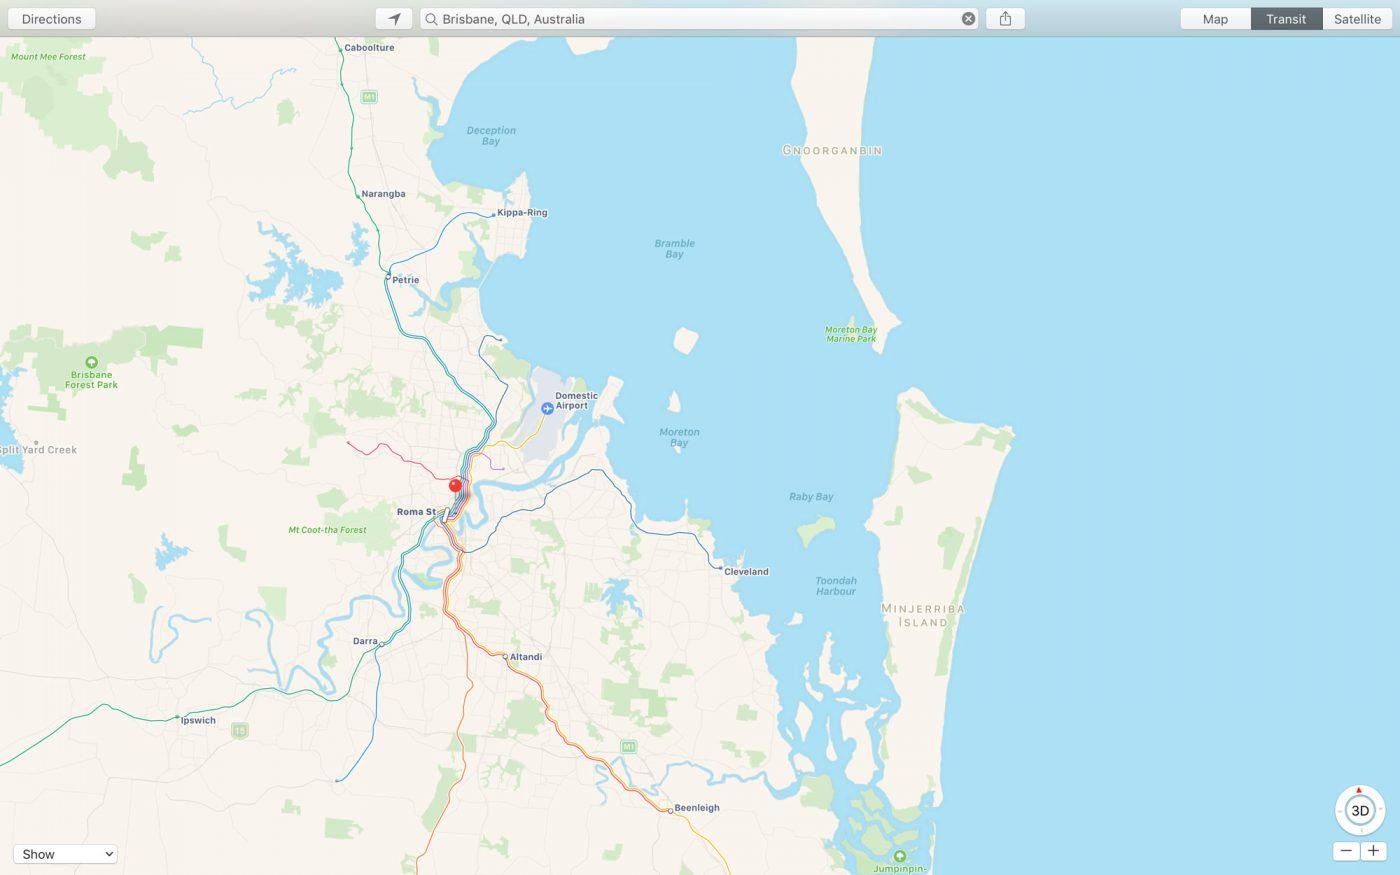 Public Transport In Apple Maps Expanded In Australia | Mac ...